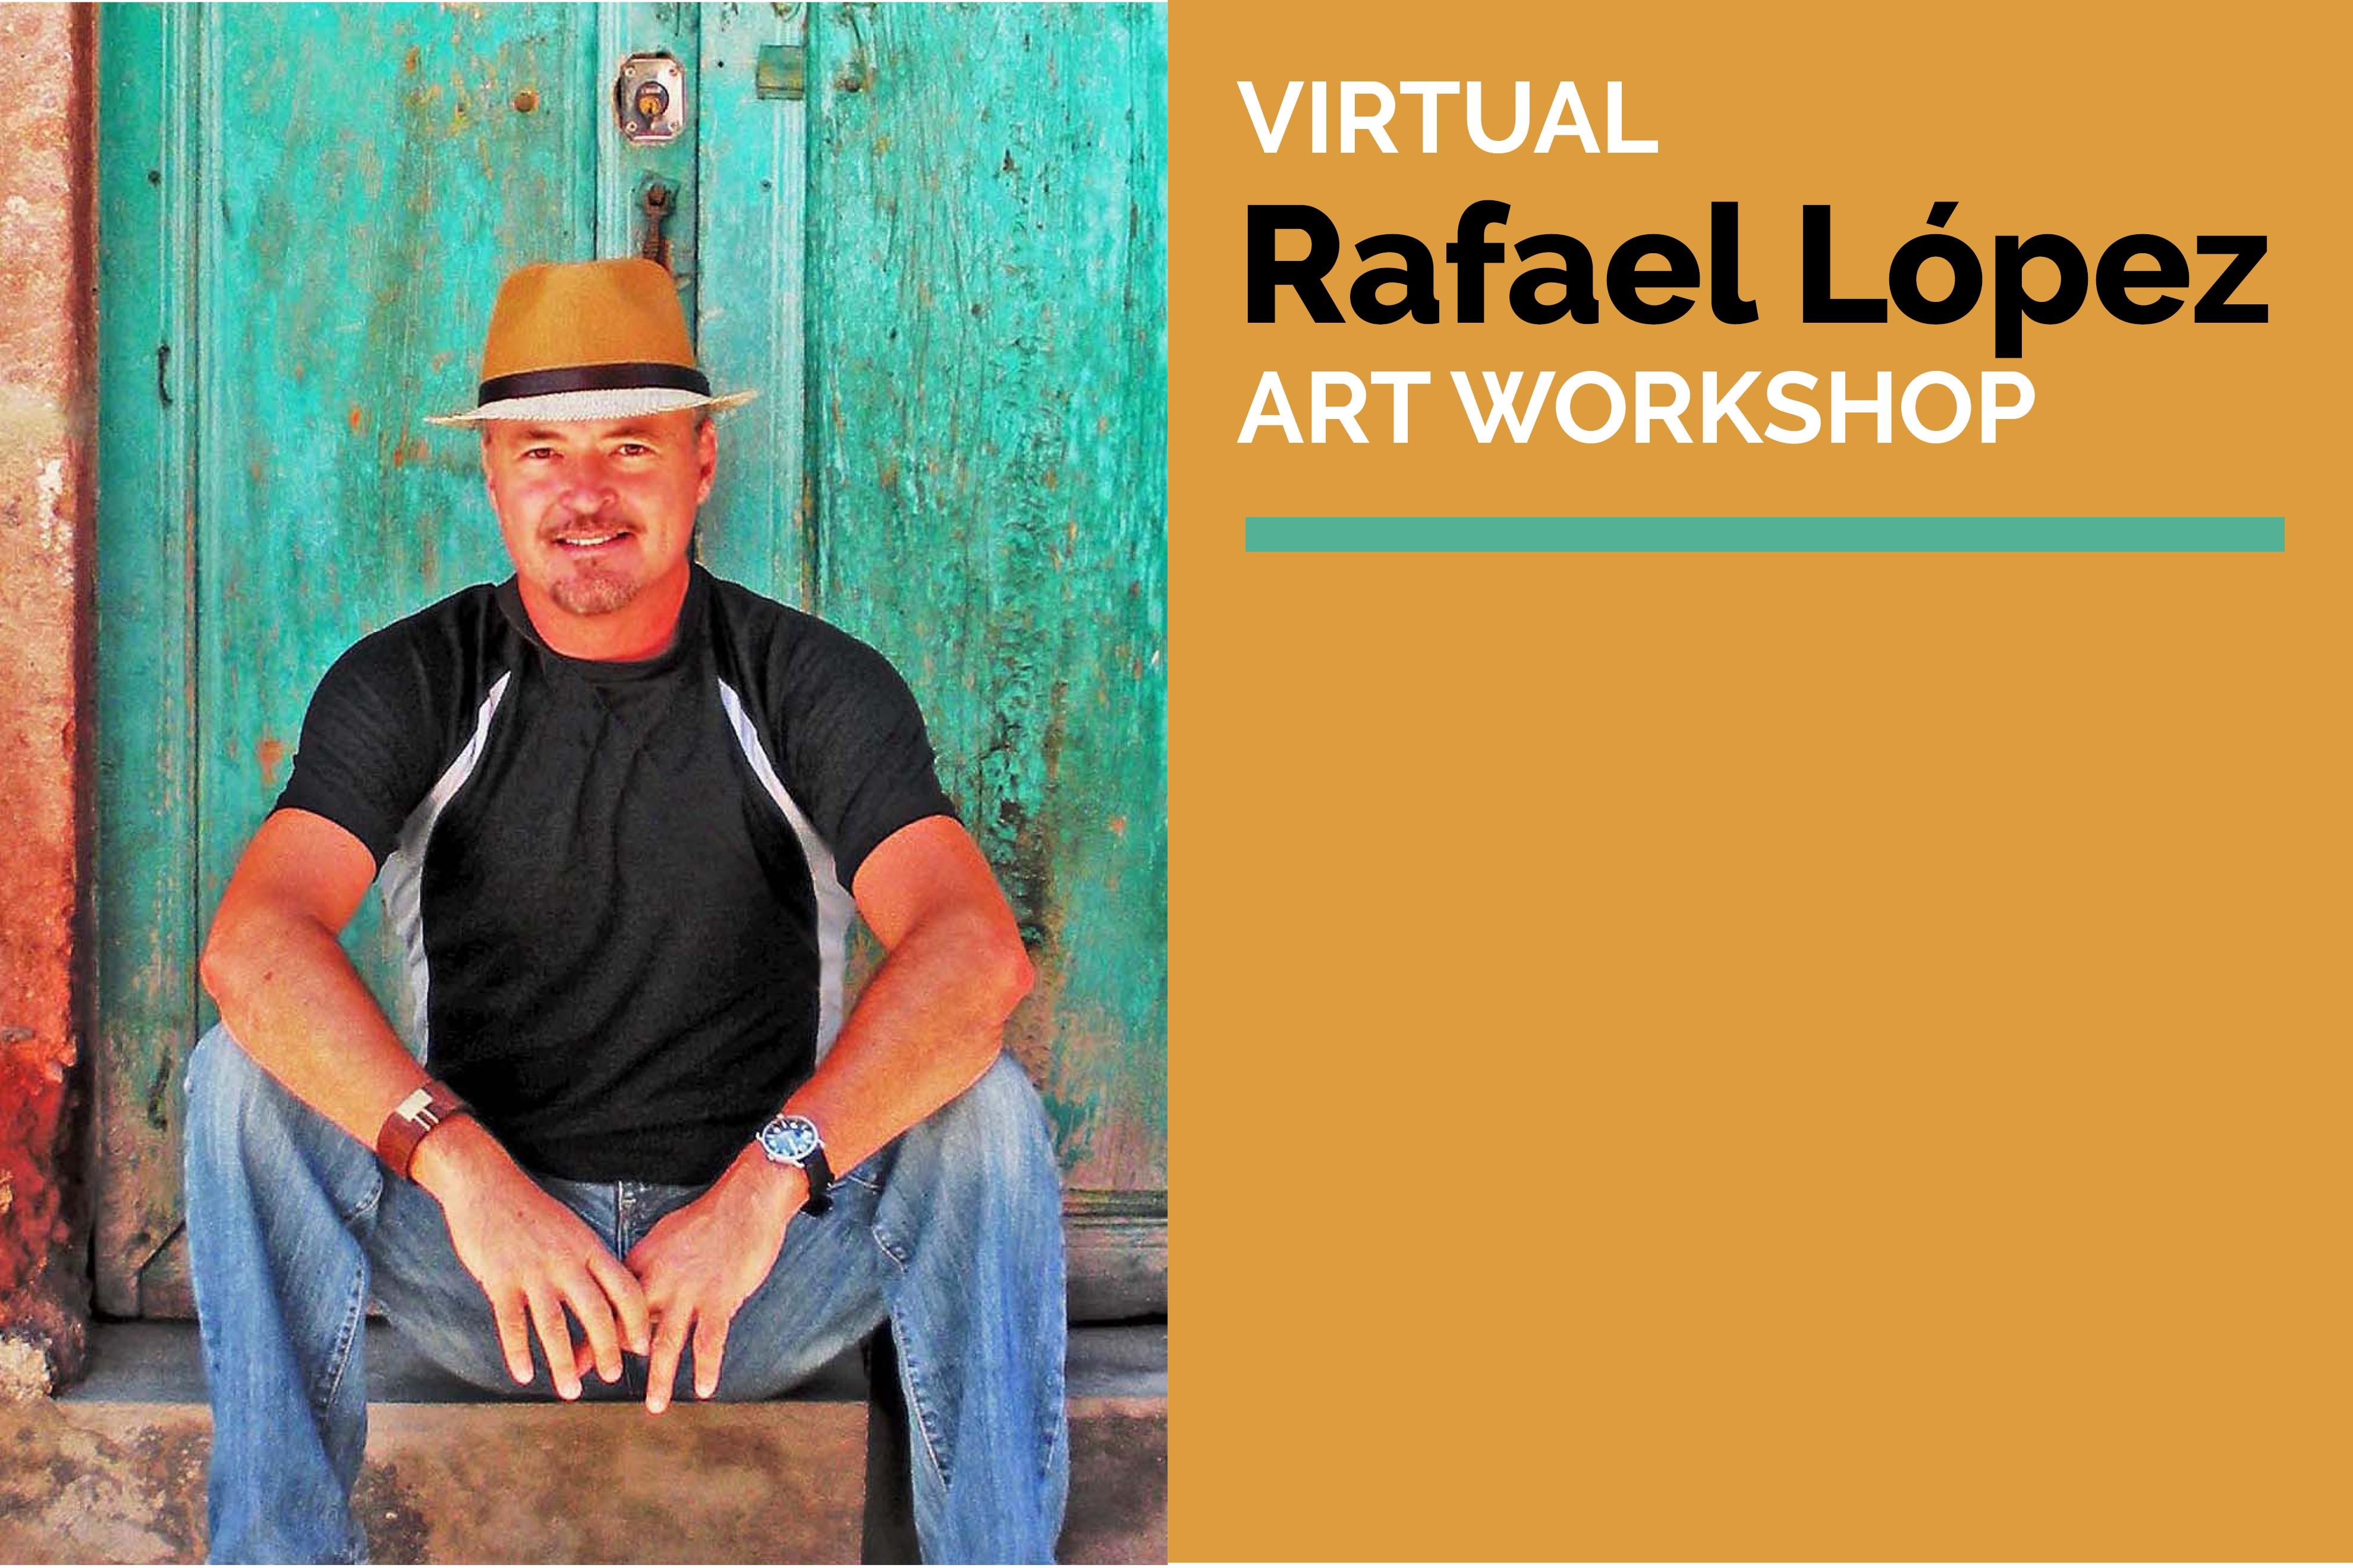 Award-Winning Illustrator Rafael Lopez leading free Art Workshops